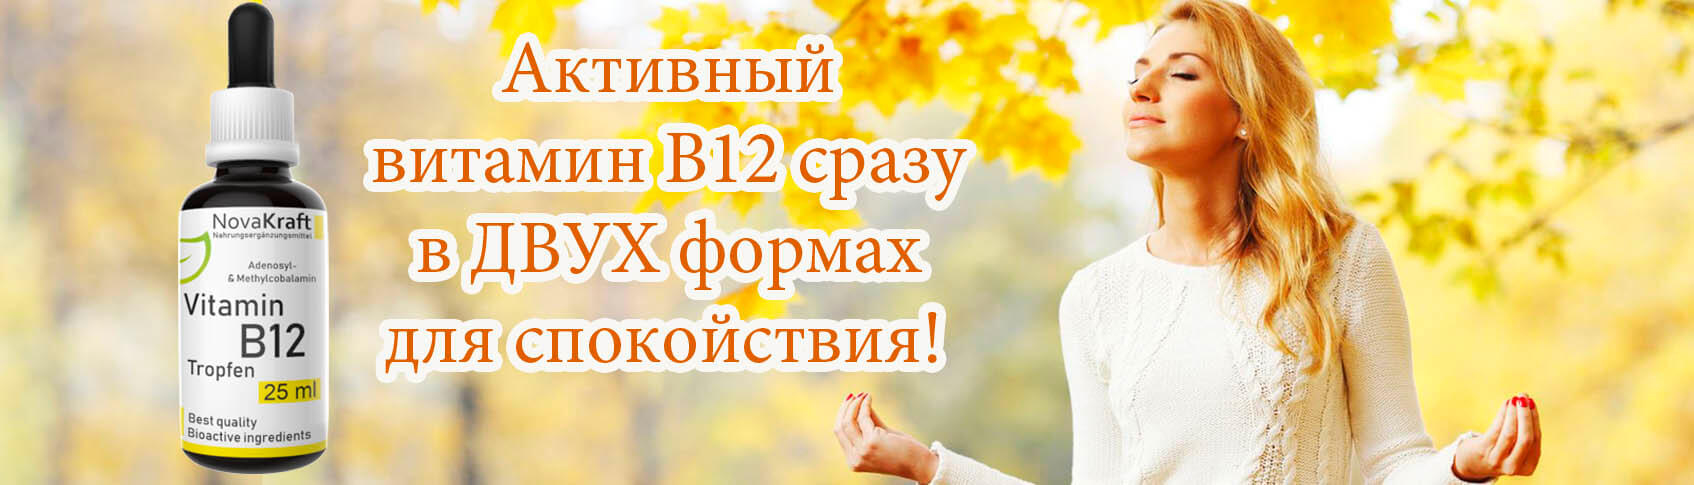 Витамин B12 метилкобаламин и аденозилкобаламин в каплях - жидкий